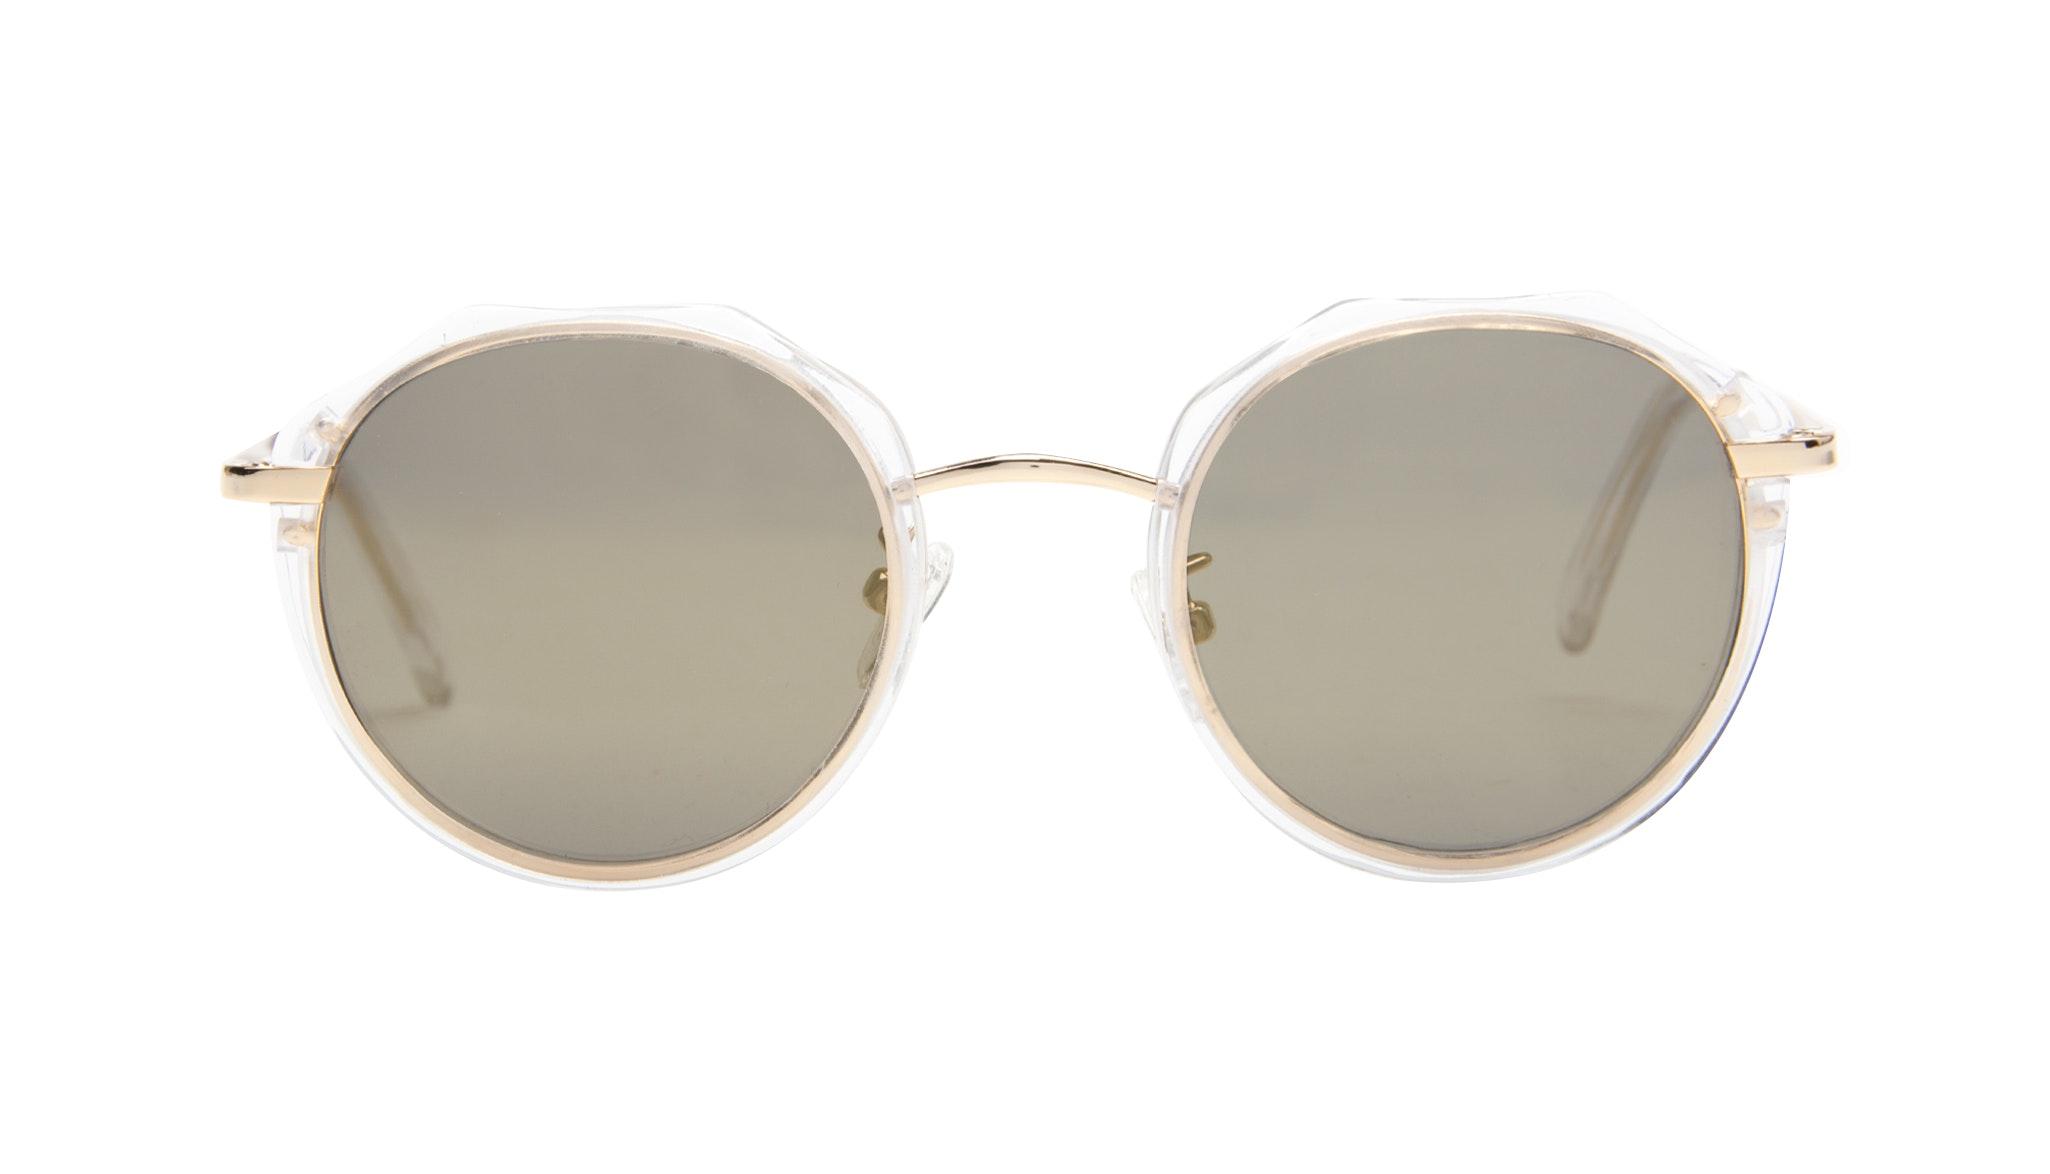 Affordable Fashion Glasses Round Sunglasses Women Vitality Gold Diamond